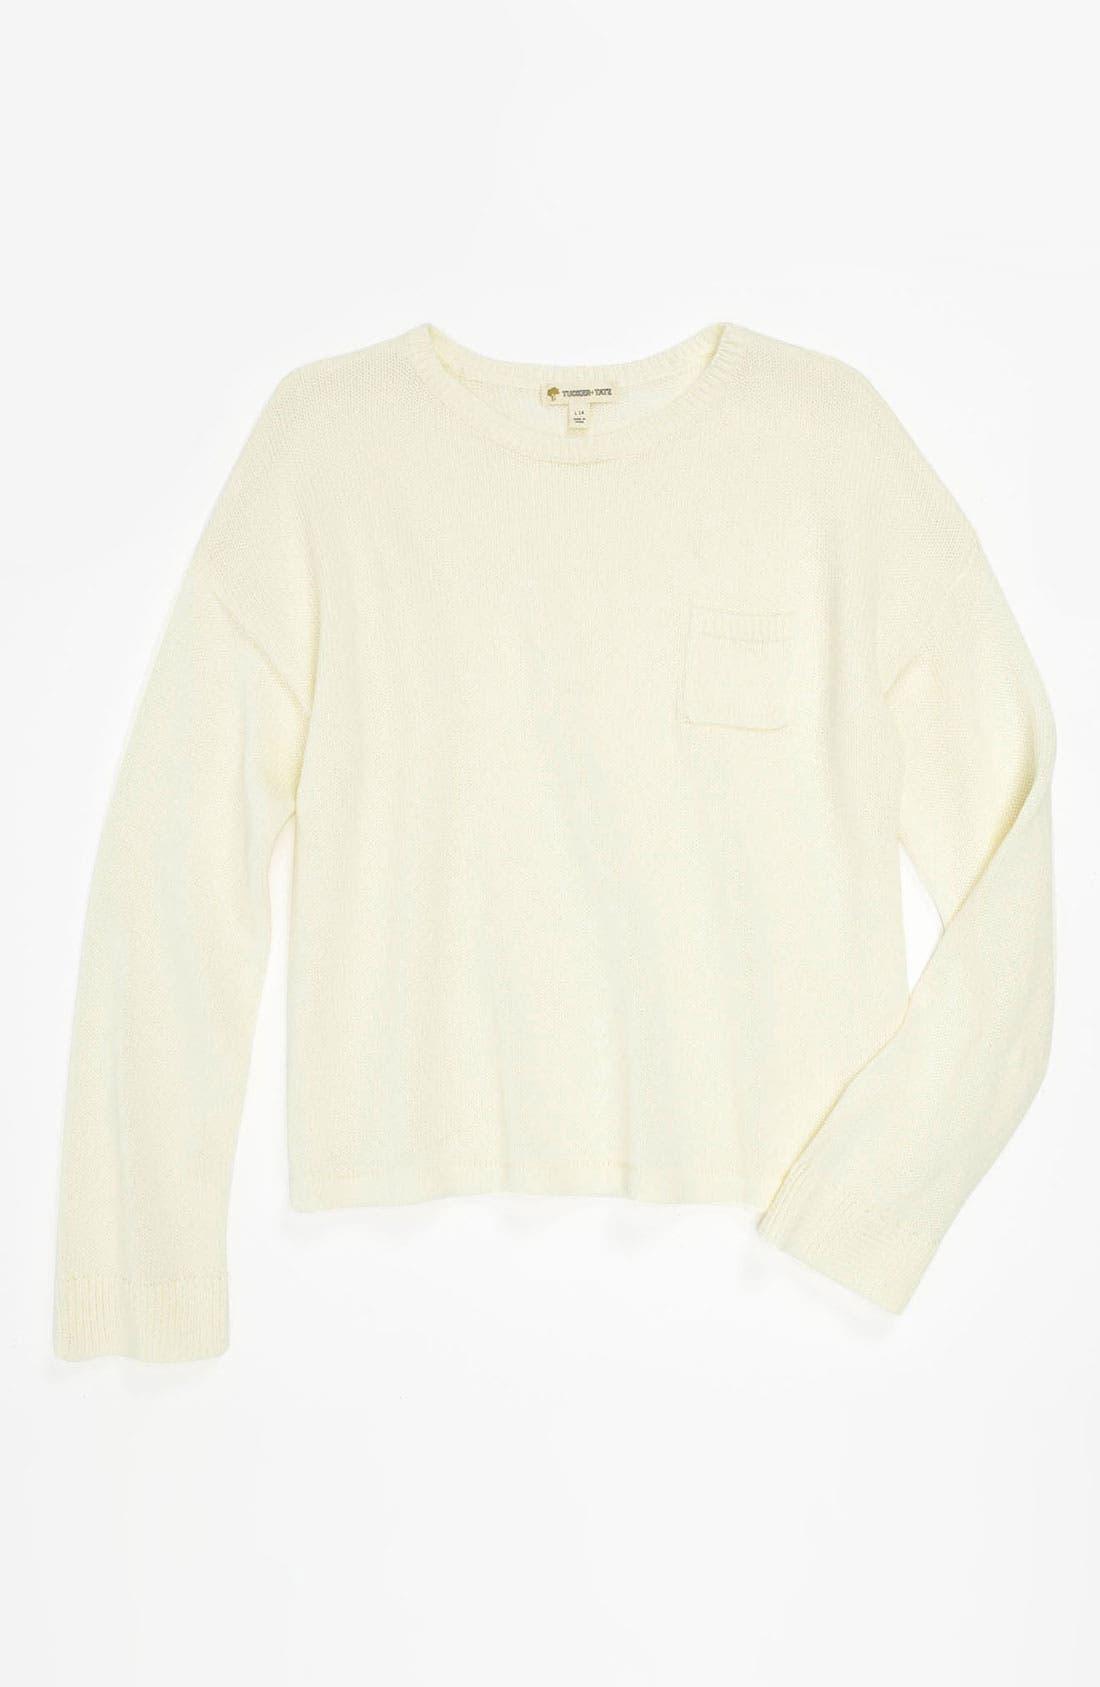 Alternate Image 1 Selected - Tucker + Tate 'Marlin' Sweater (Big Girls)